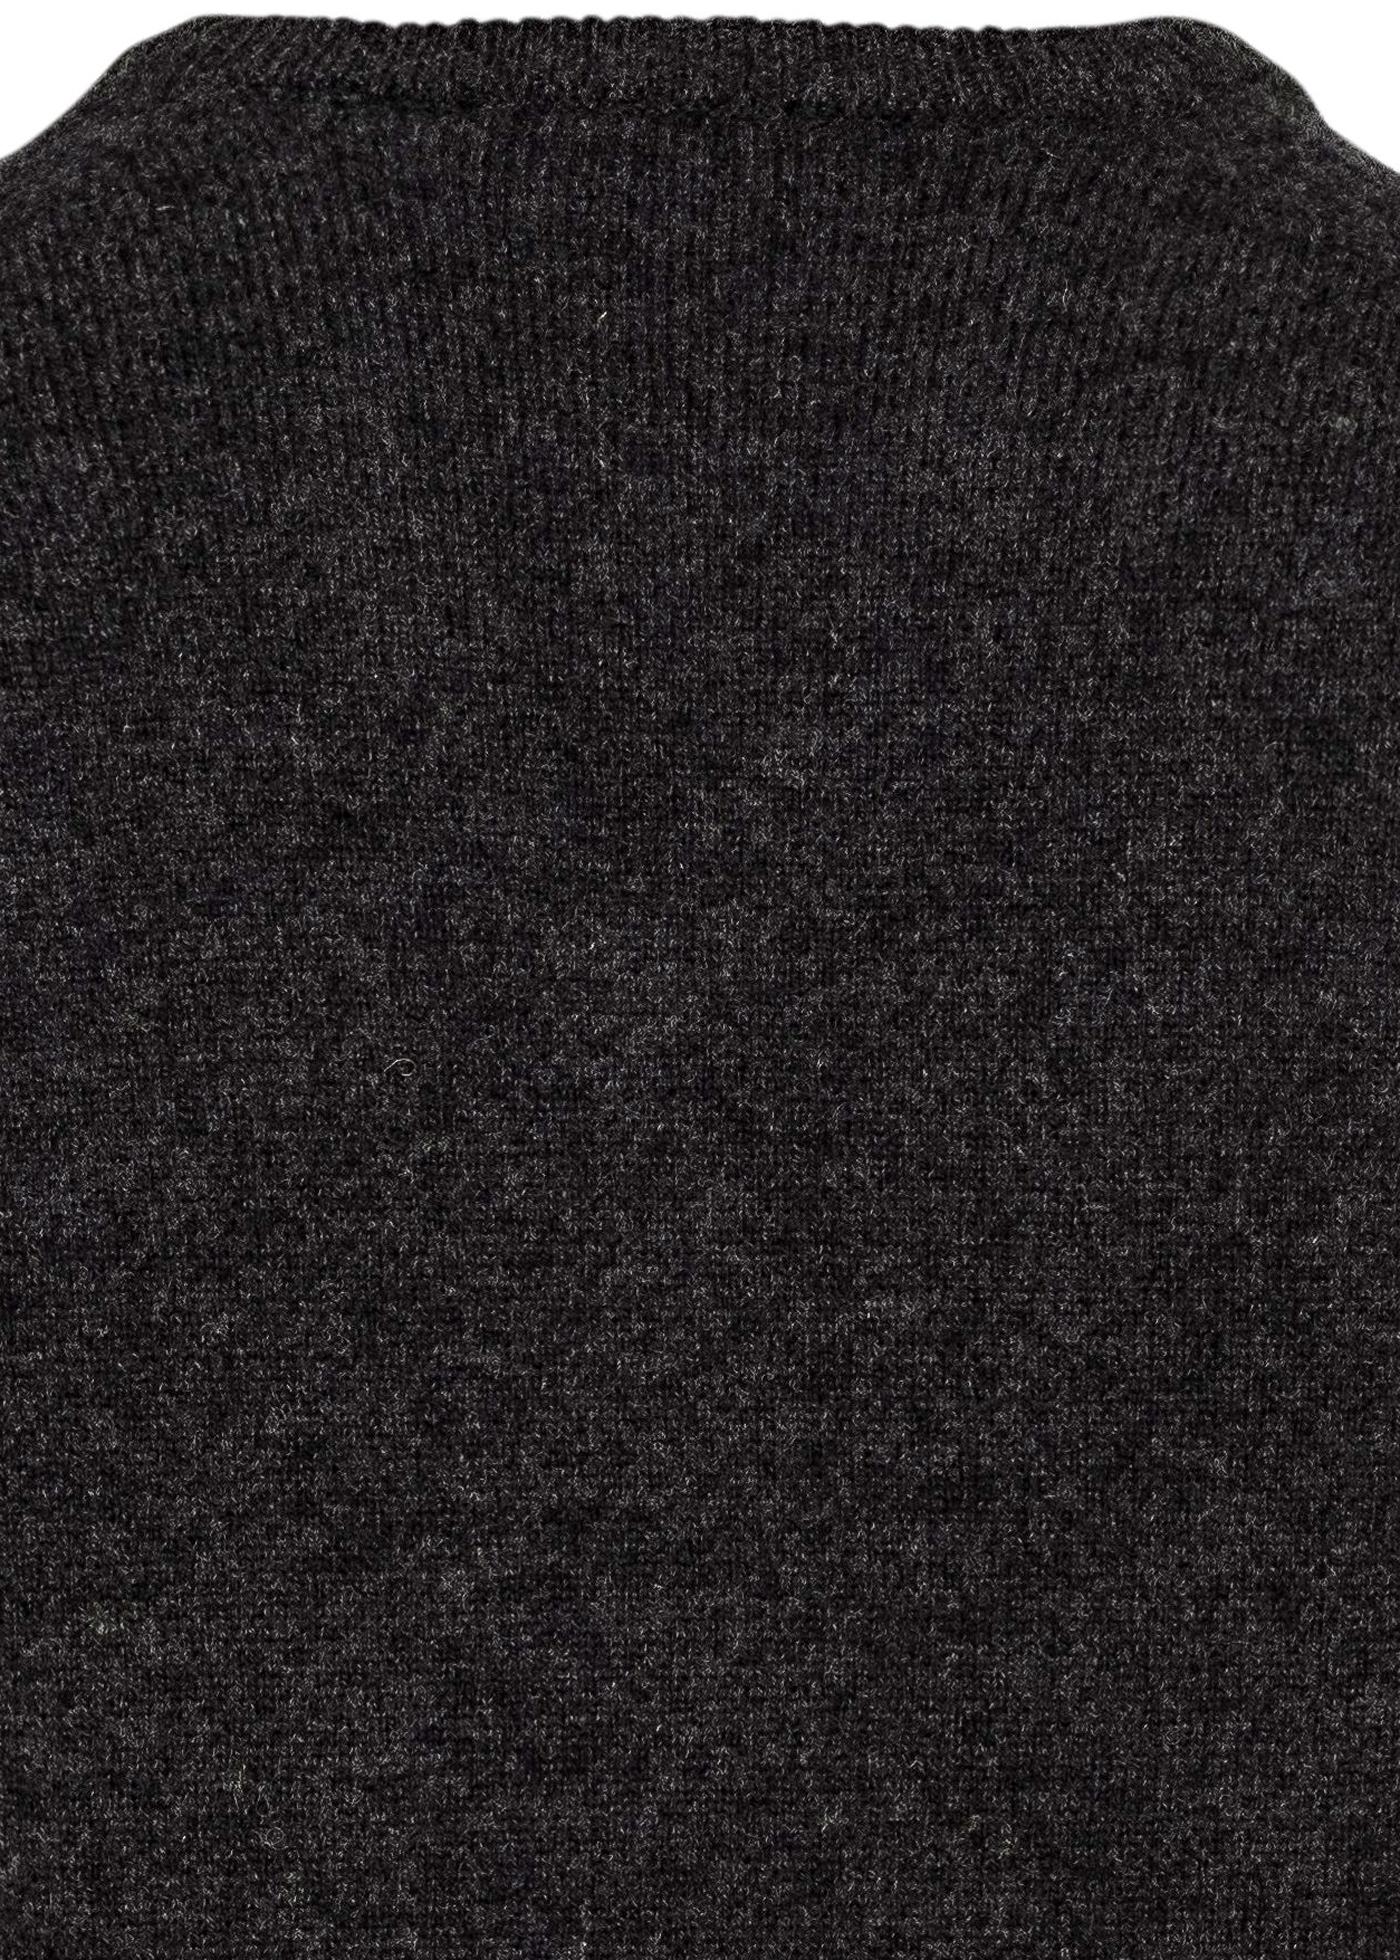 LAMBSWOOL V NECK image number 3